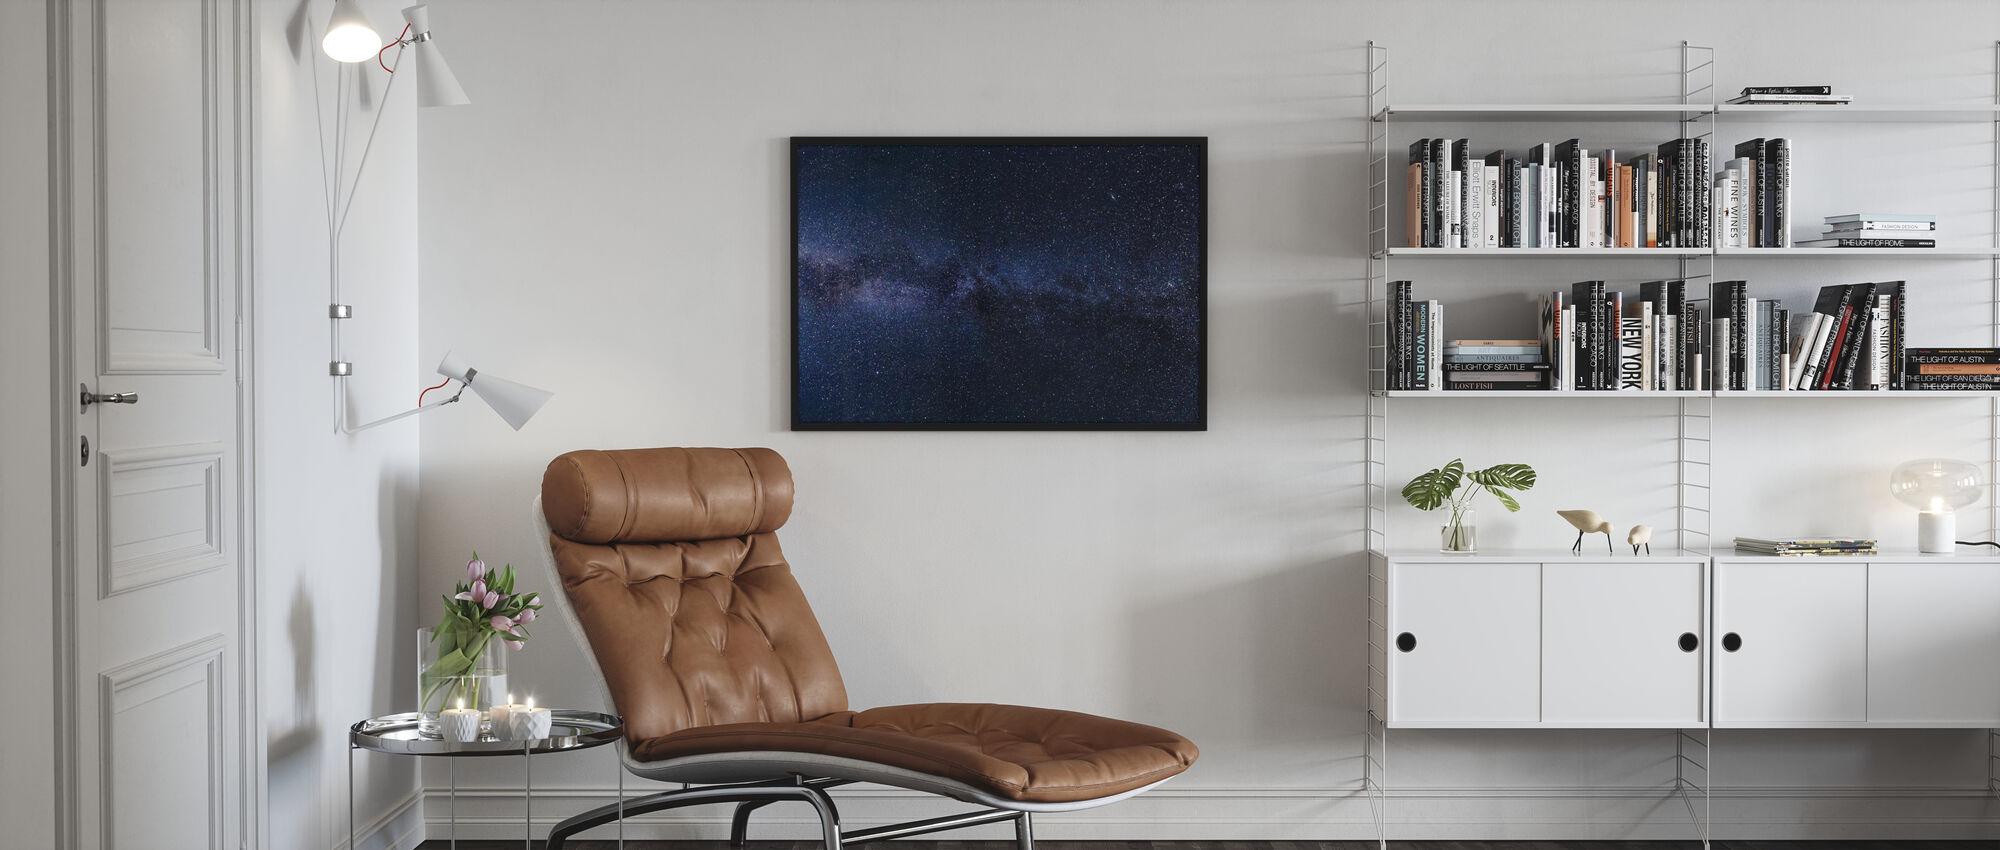 Mystical Starry Sky - Poster - Living Room